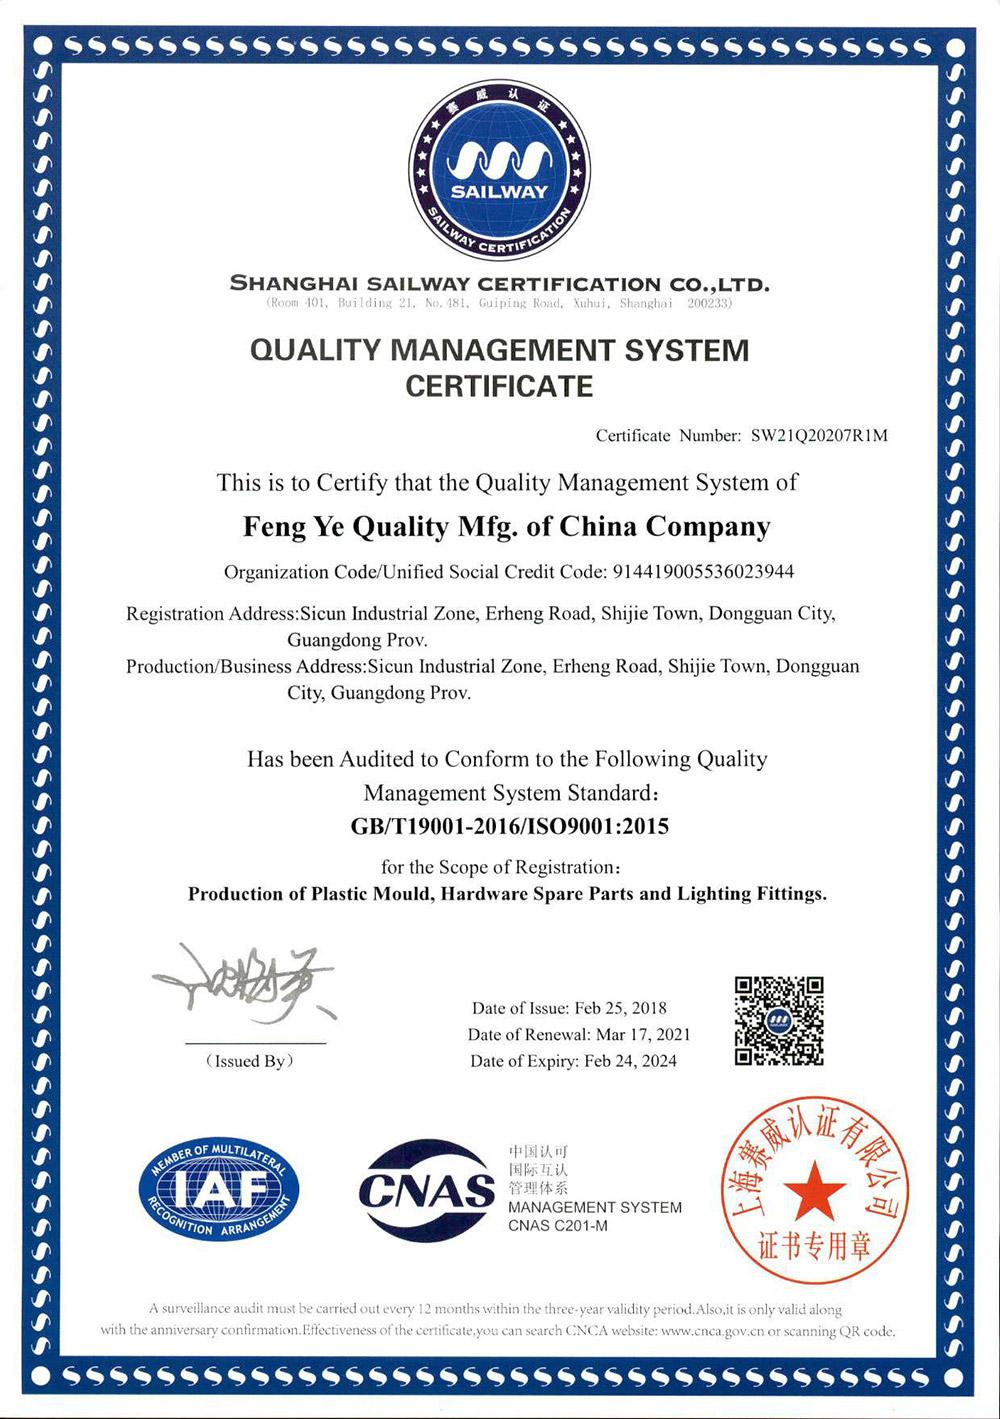 ISO9001-2015-certificate-FengYe.jpg